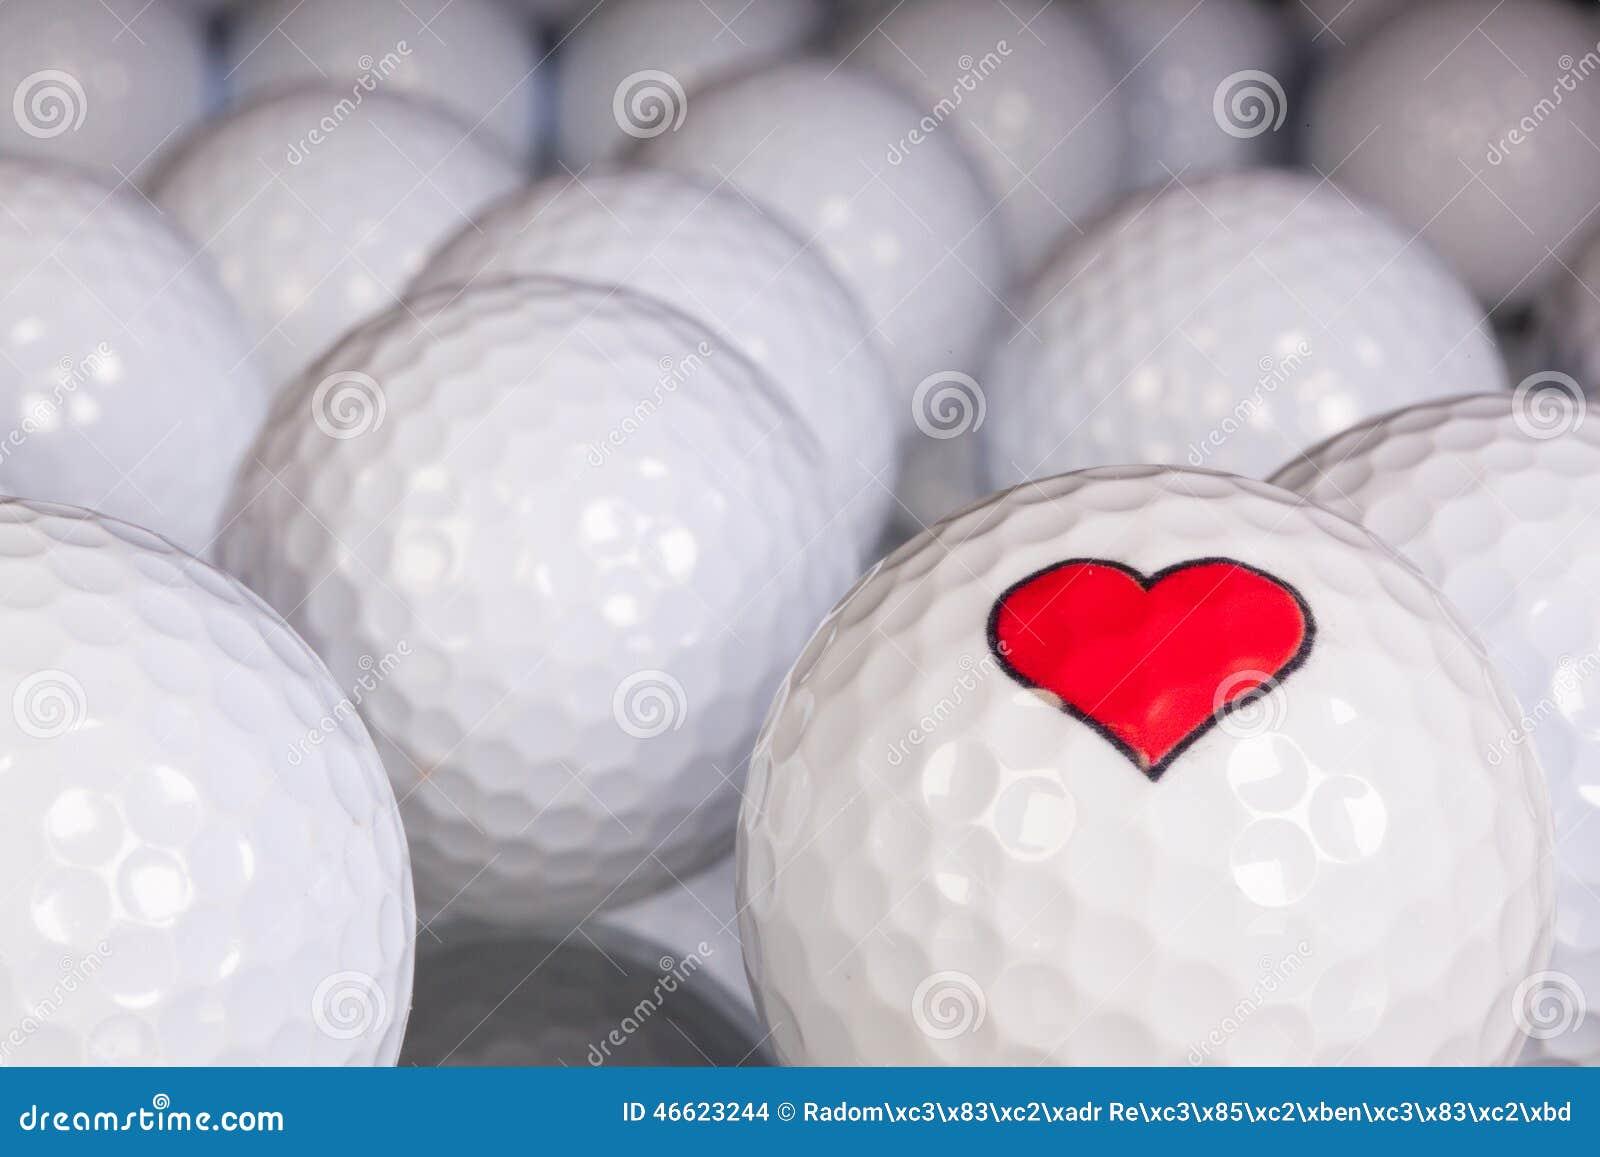 Golf balls with love symbol